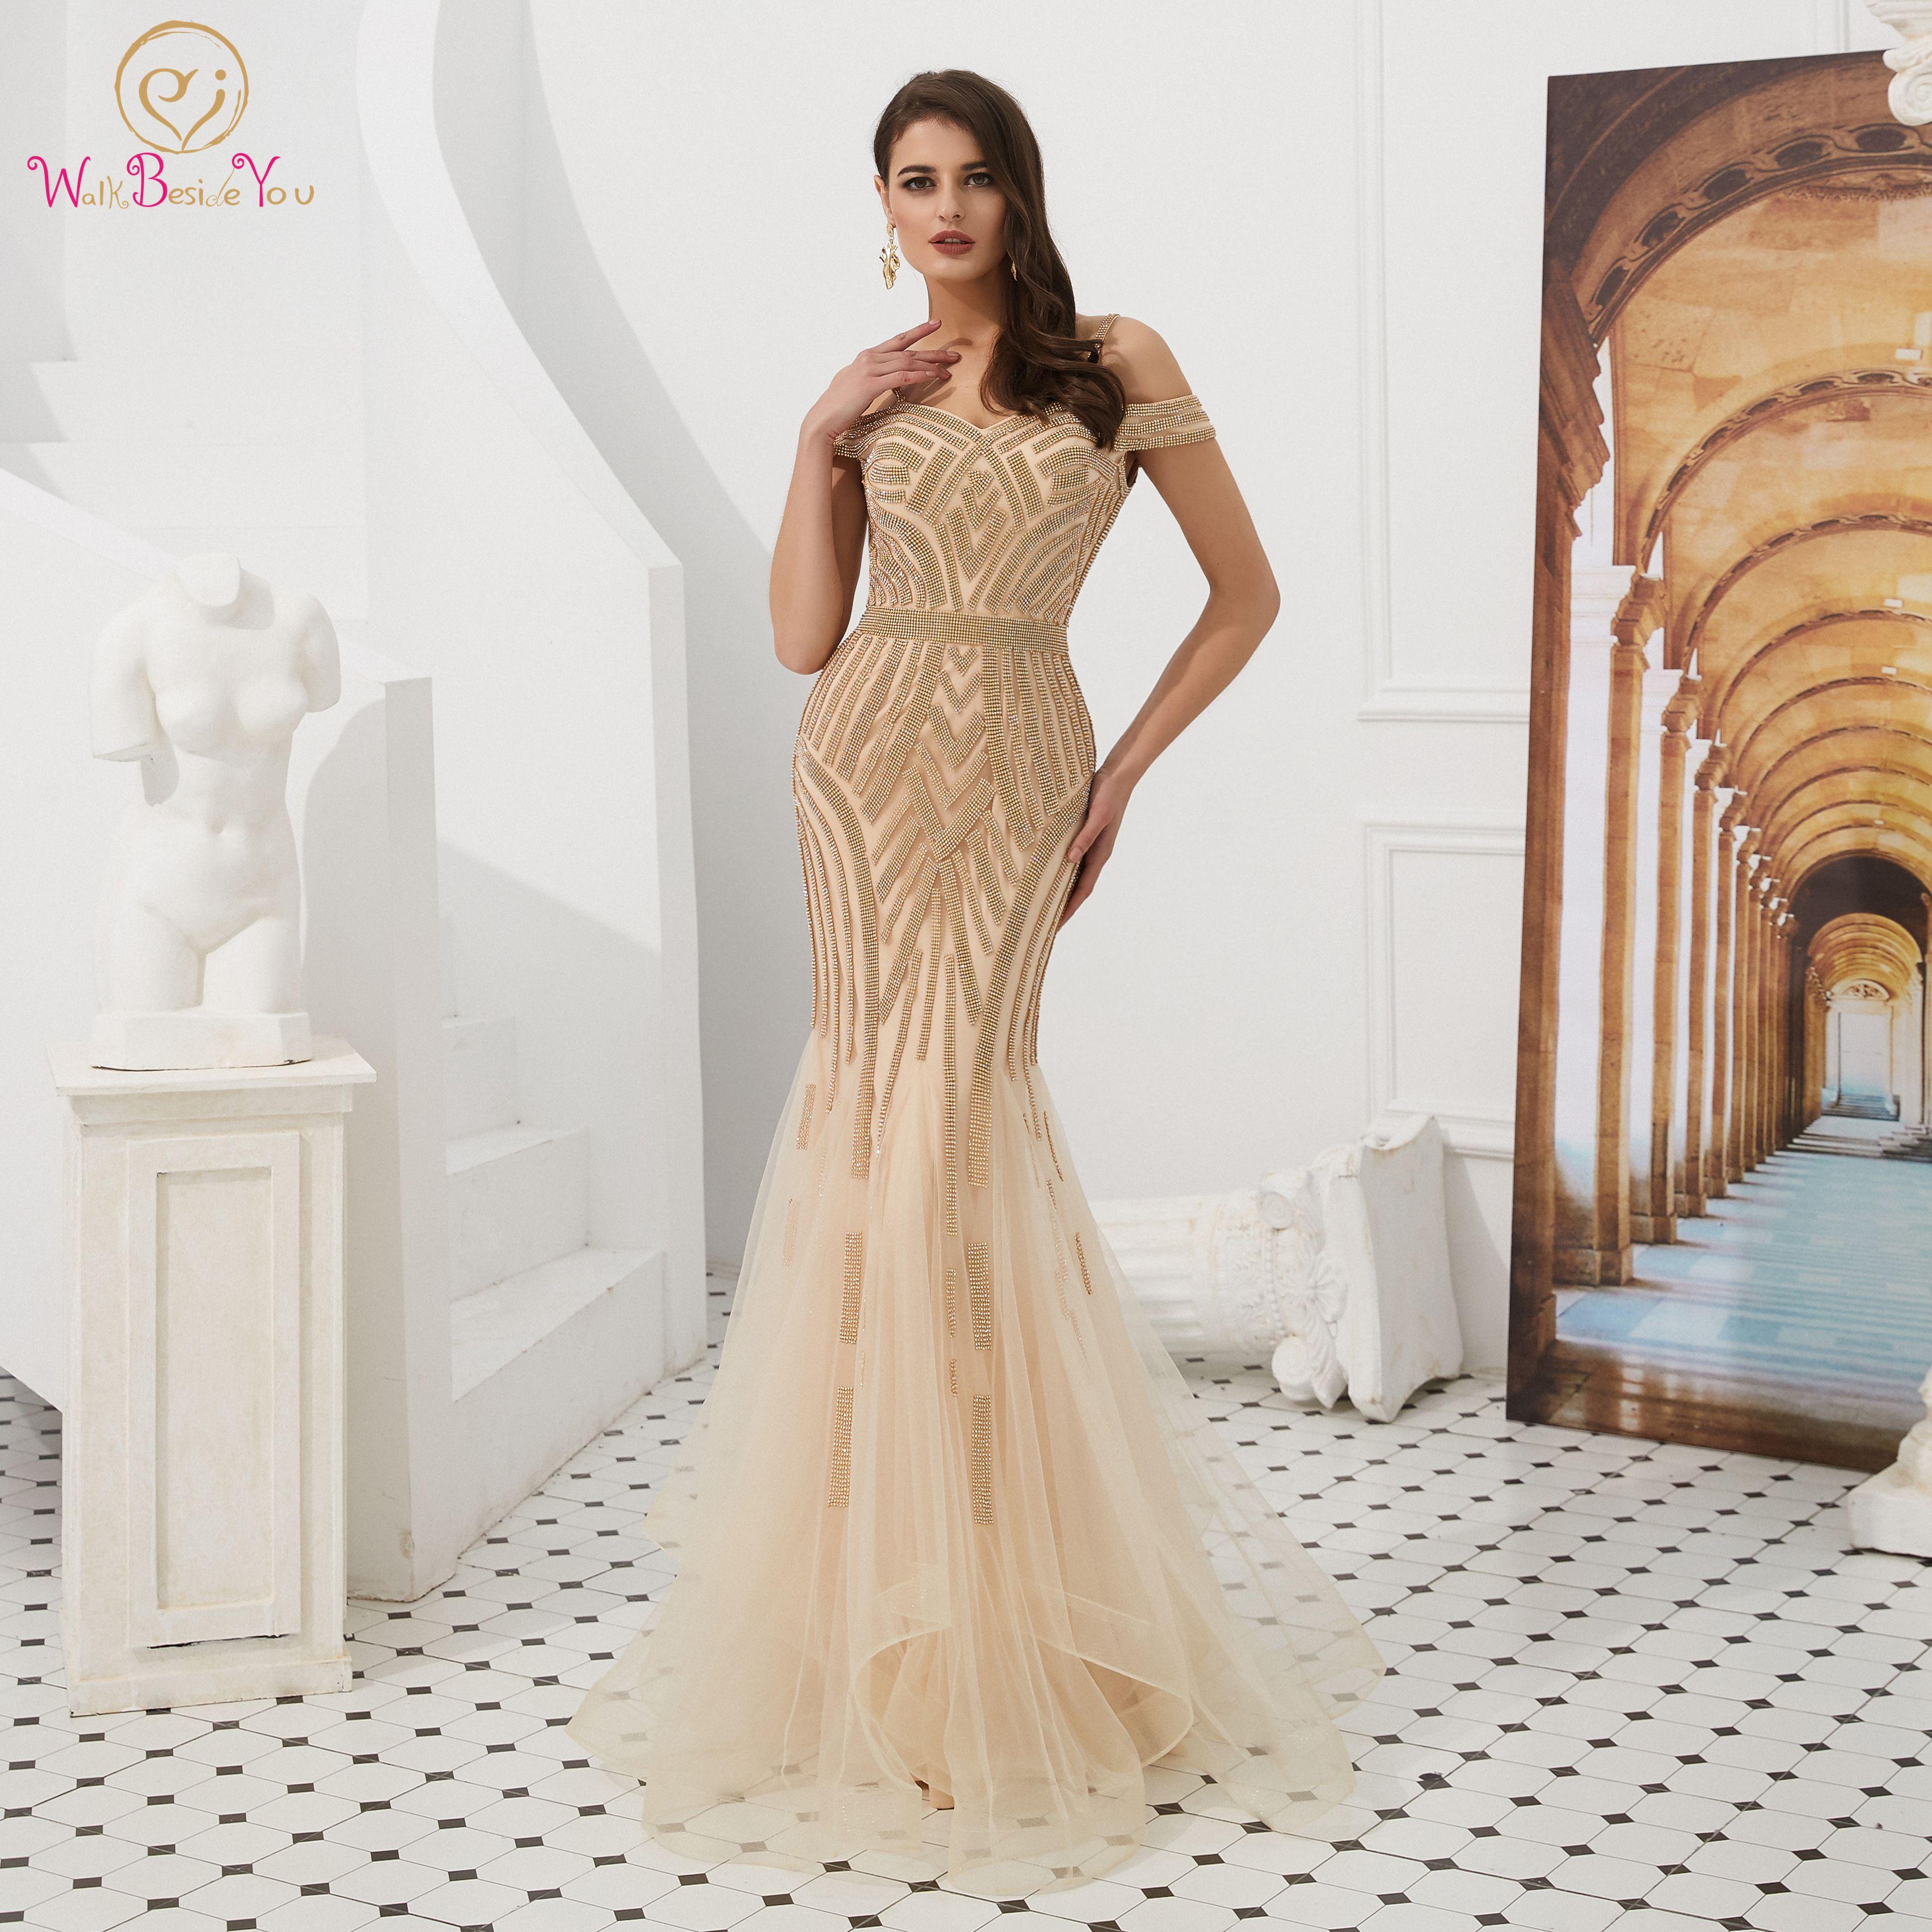 Elegant Gold Mermaid Evening Dresses 2019 Sweetheart Neck Off Shoulder Formal Party Long Gowns Luxurious Crystal Vestido De Gala